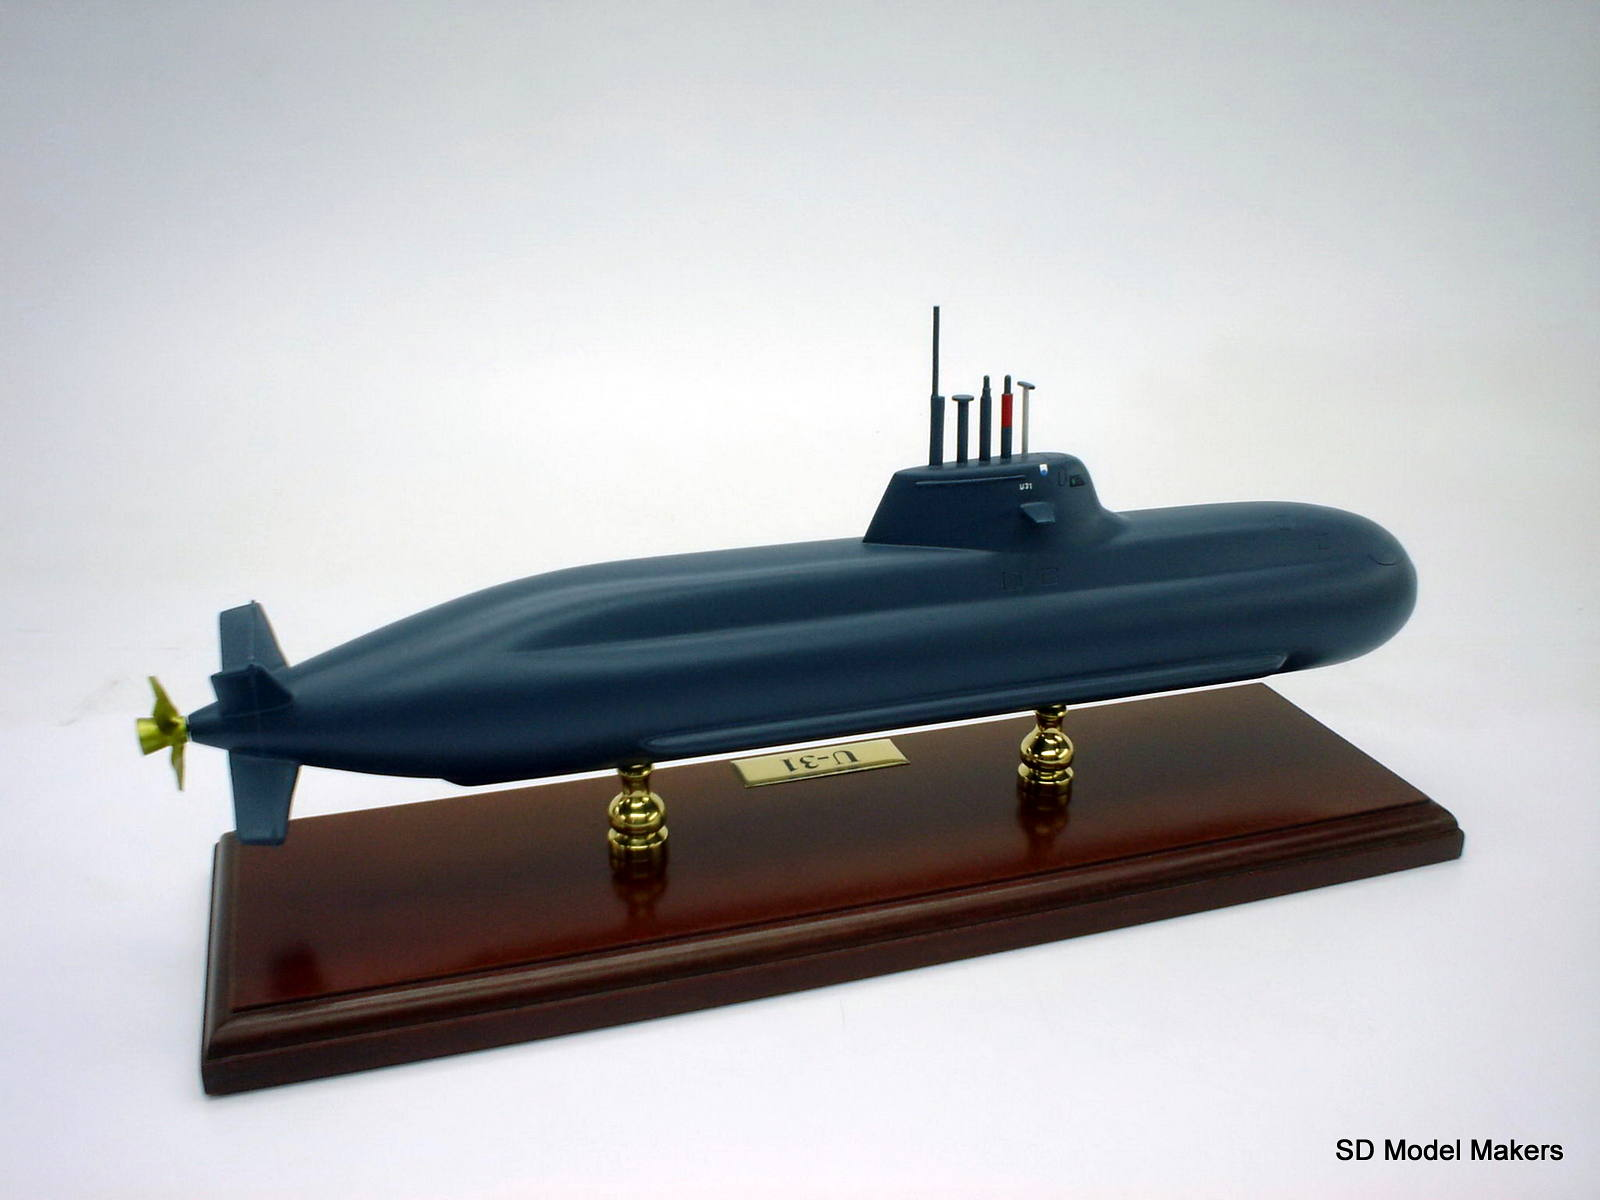 type 212 class u-boat models